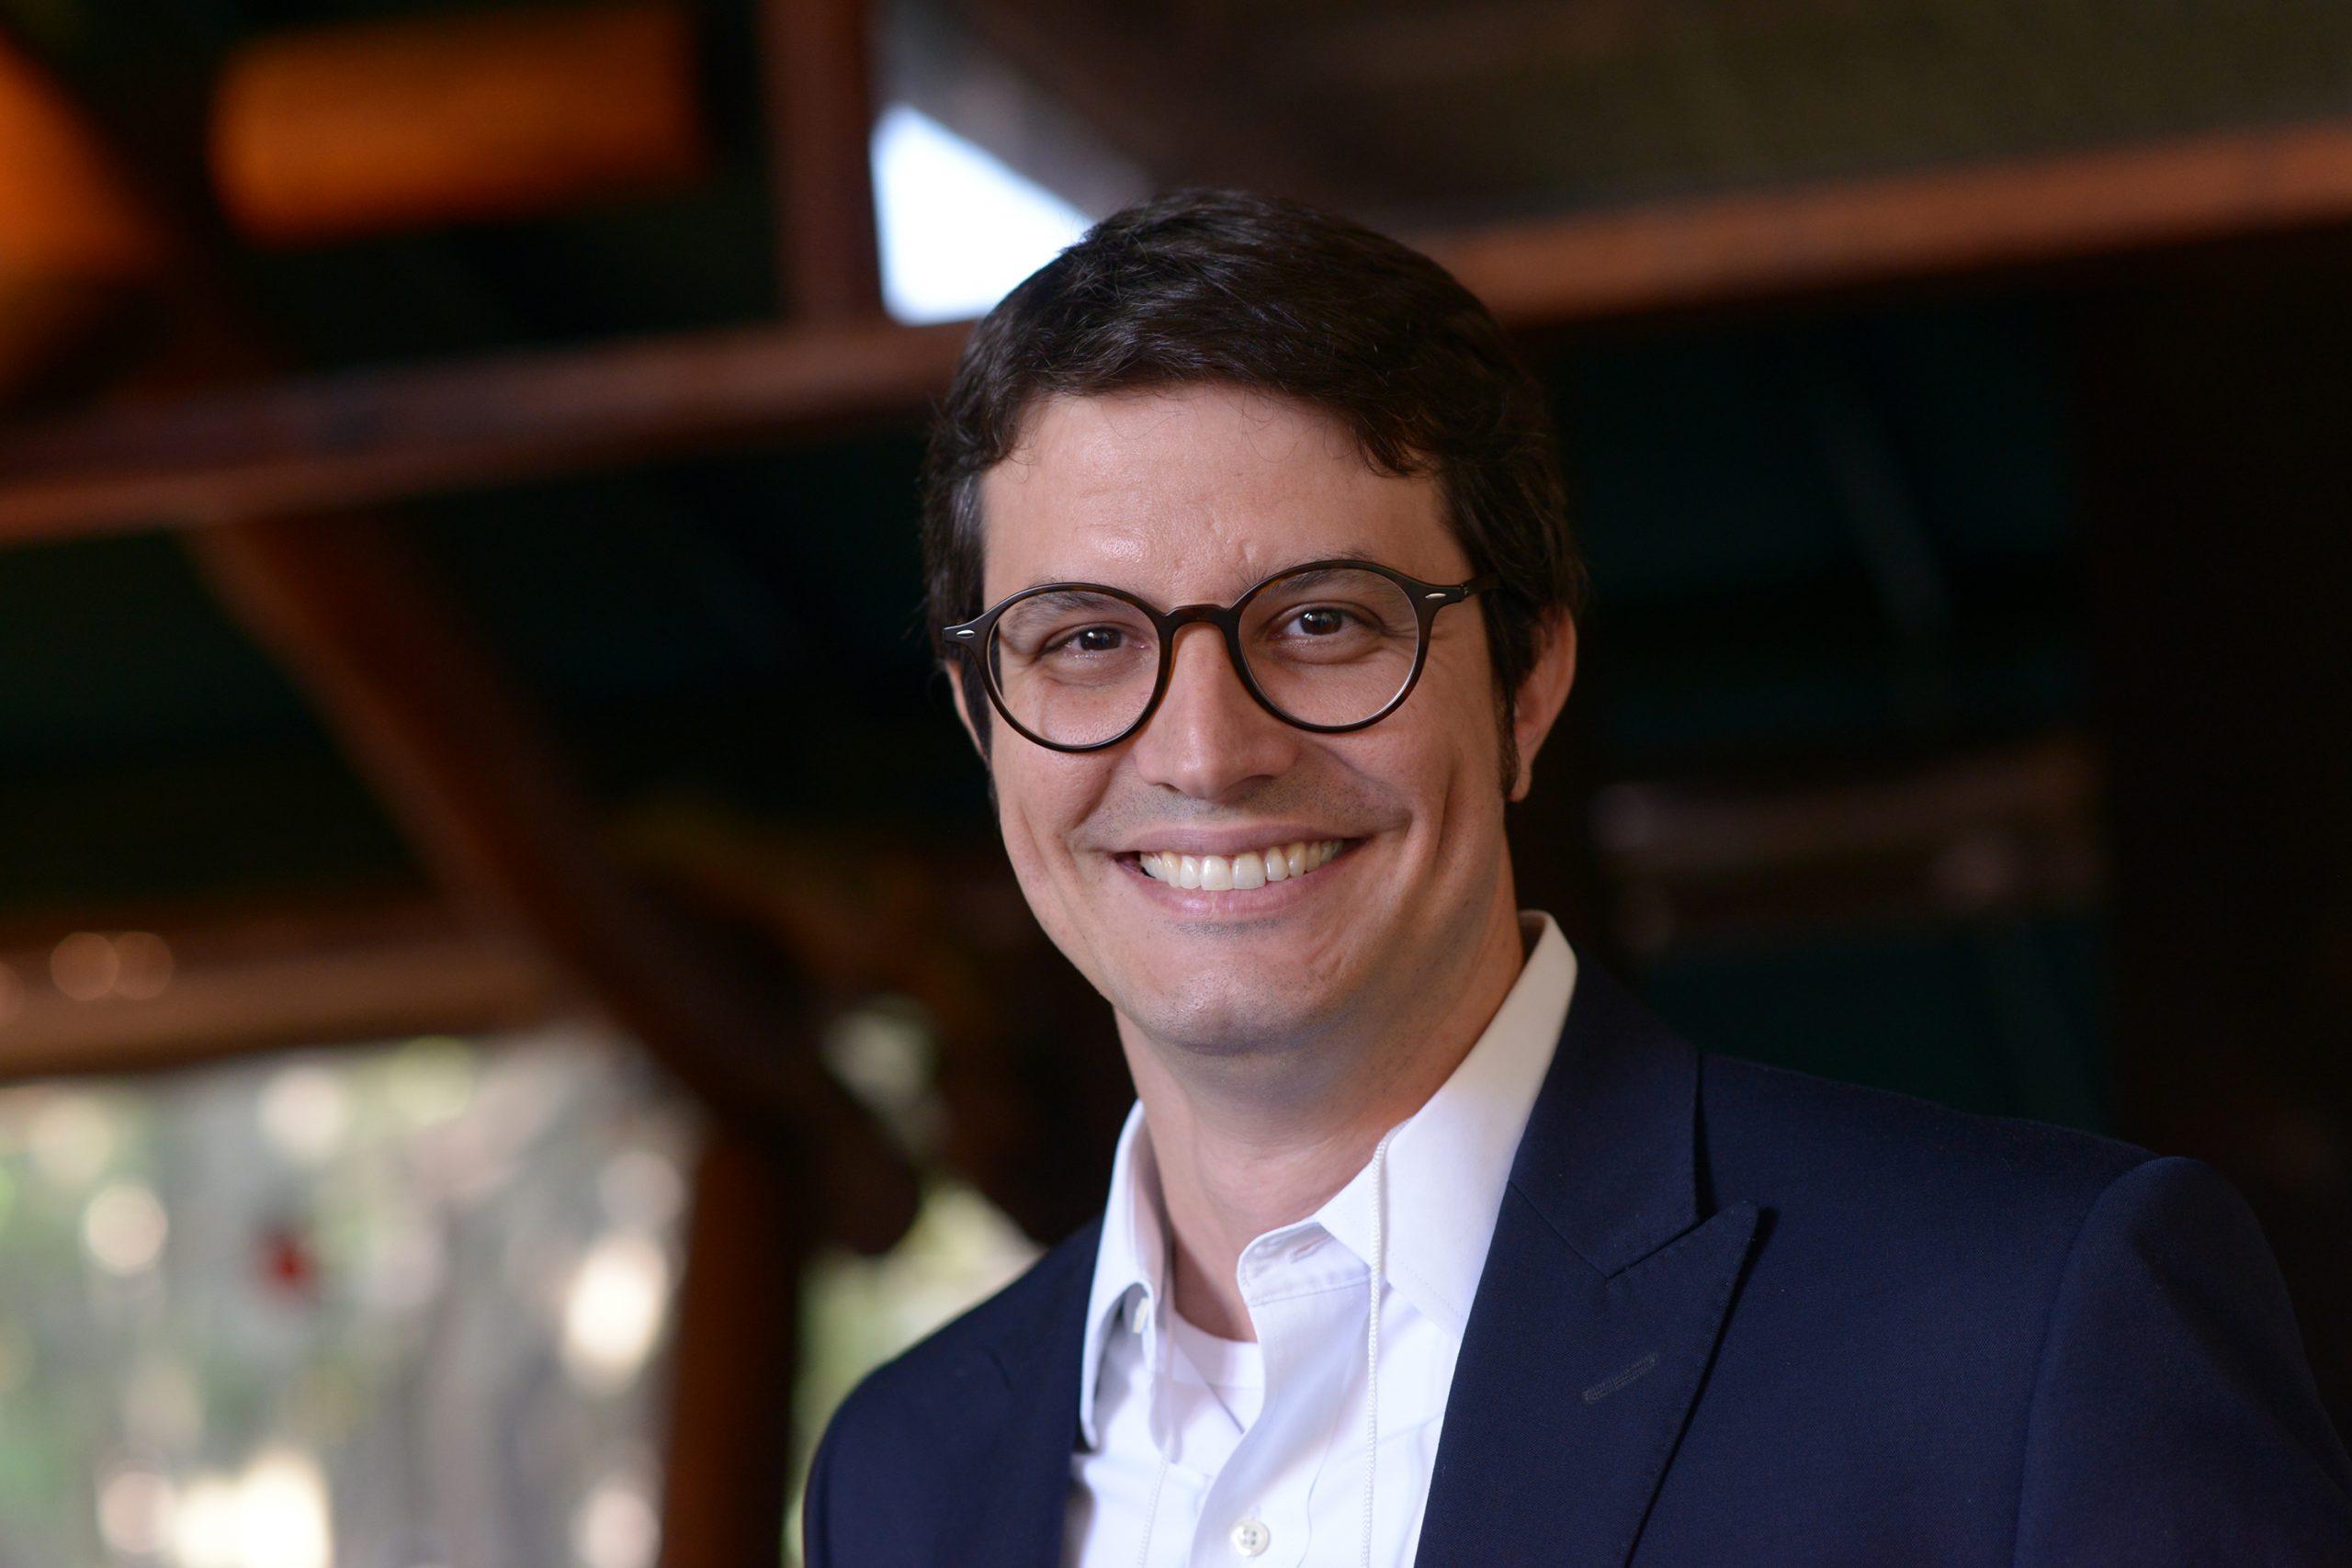 Rodrigo Menezes